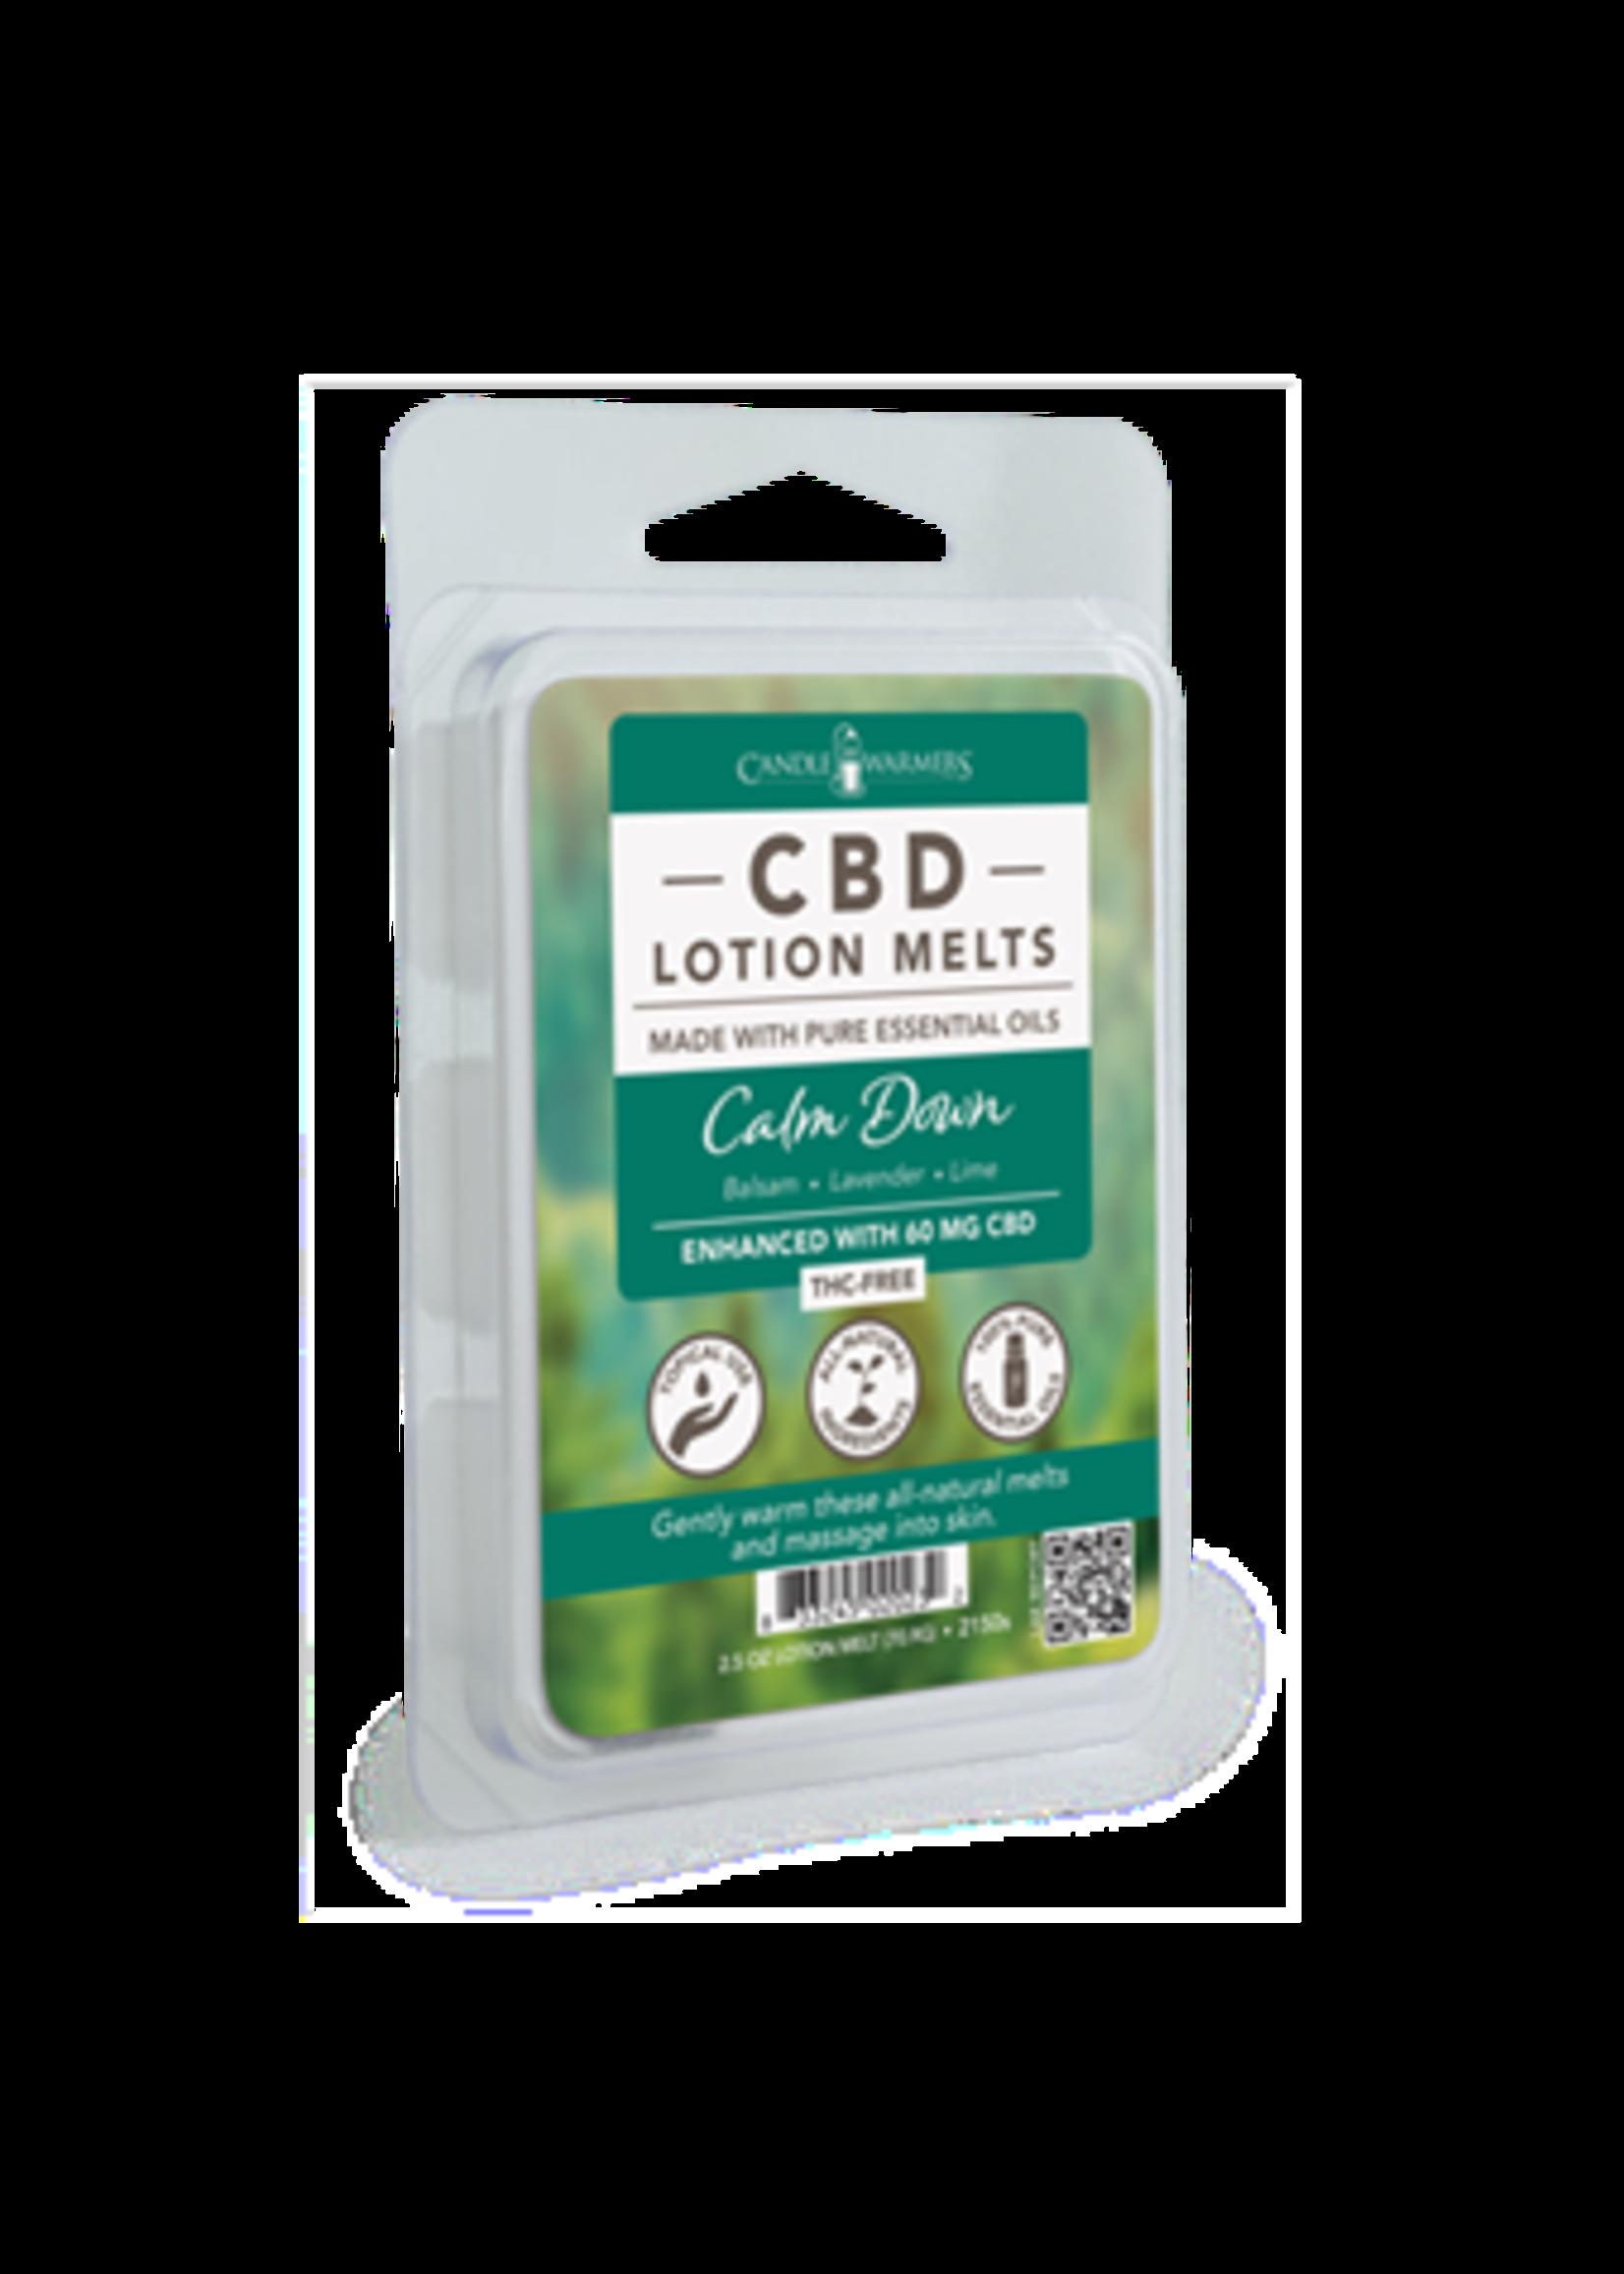 Candles Warmers Etc CBD Lotion Wax Melt Calm Down 2.5oz